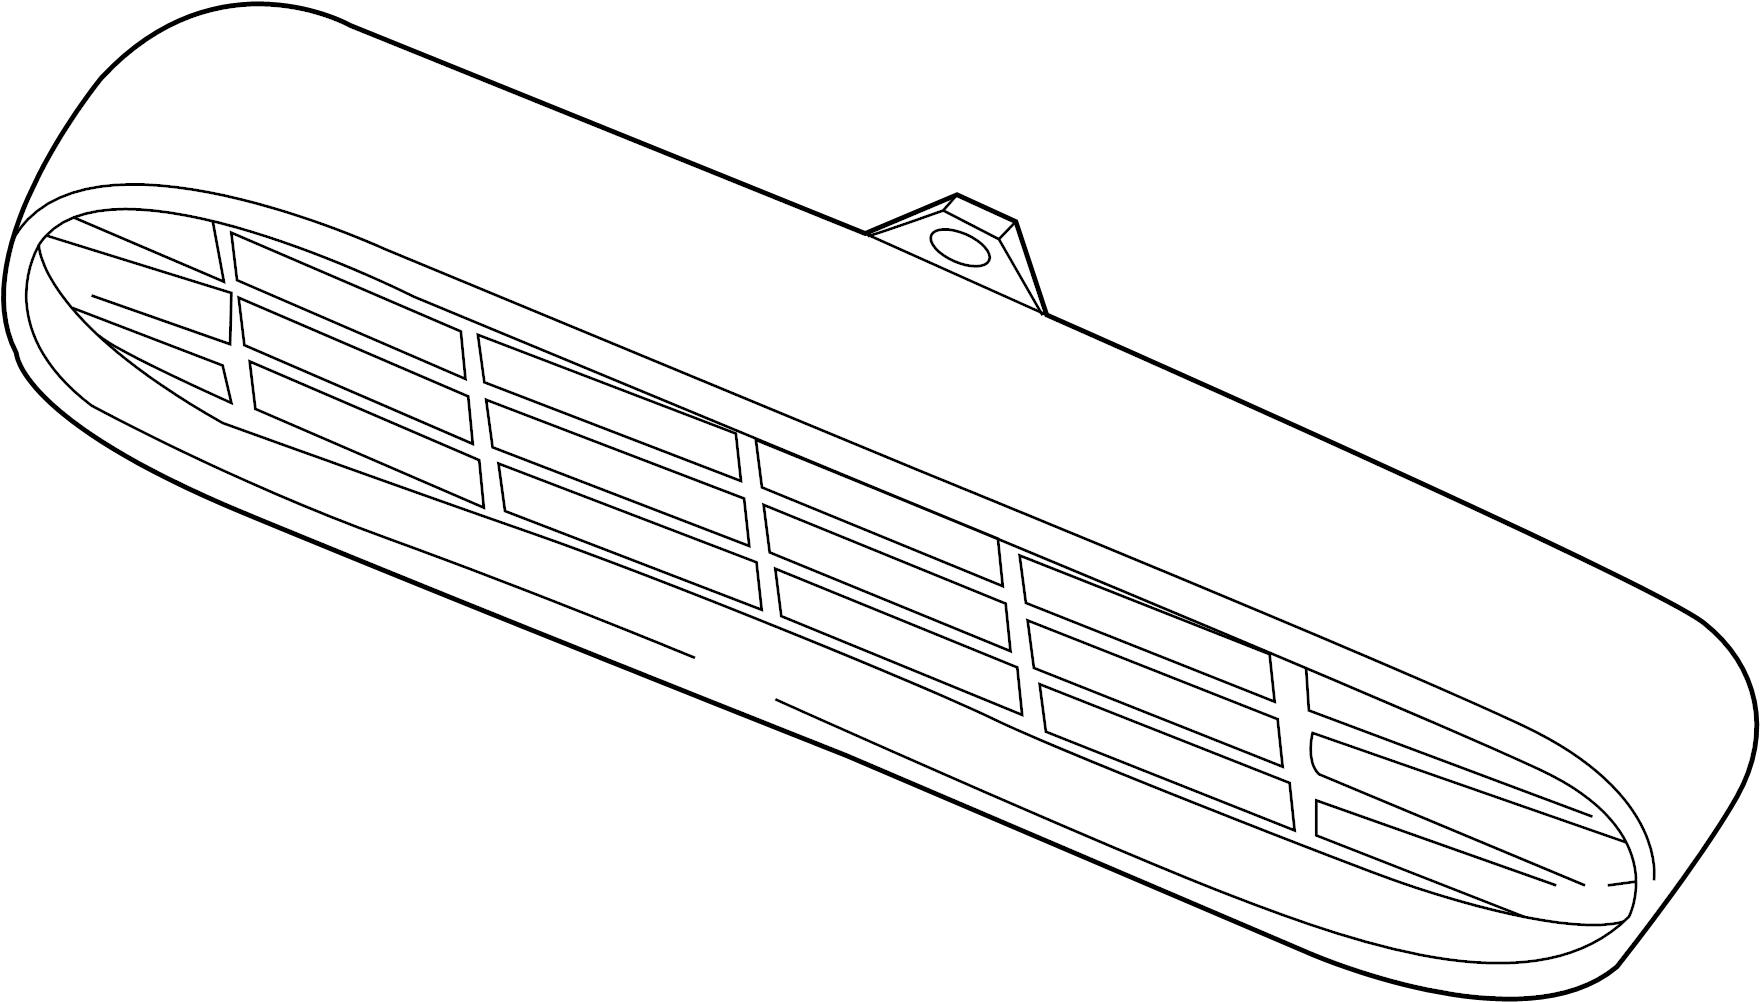 Nissan Quest Grille Front Trim Interior Body